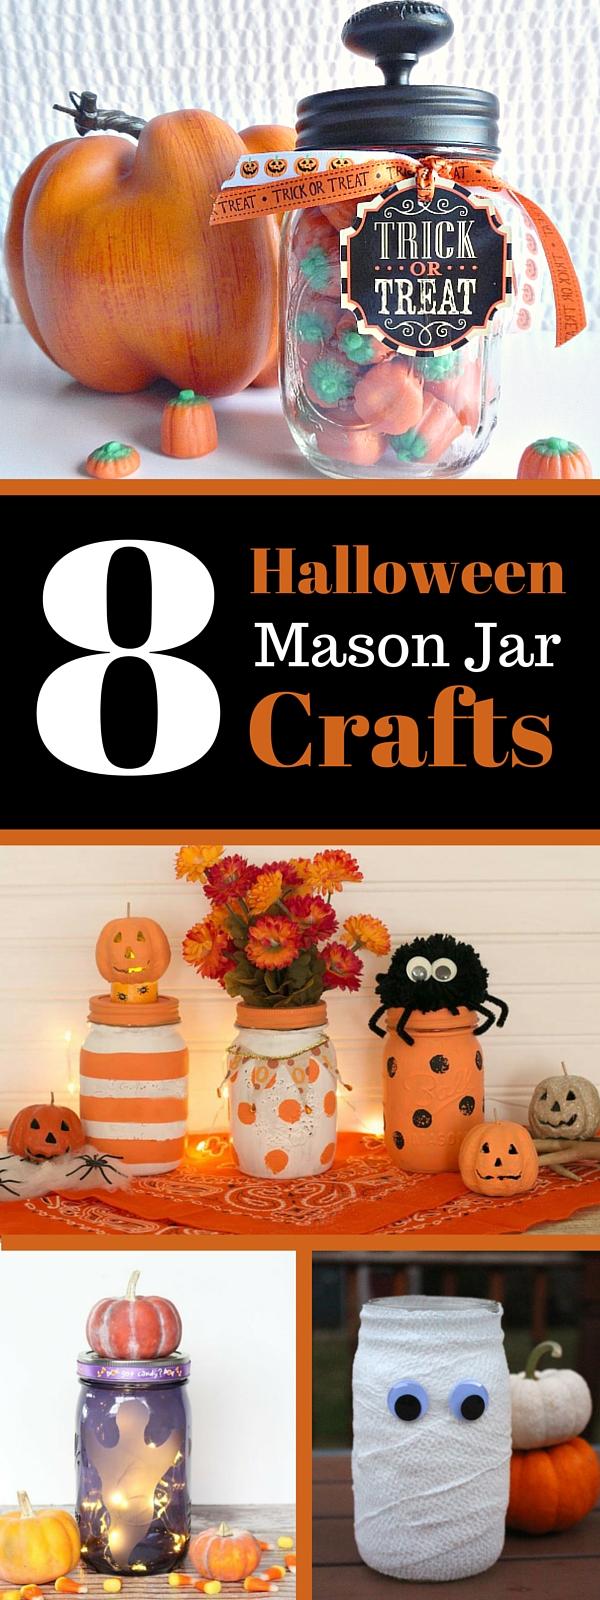 8 Halloween Mason Jar Crafts